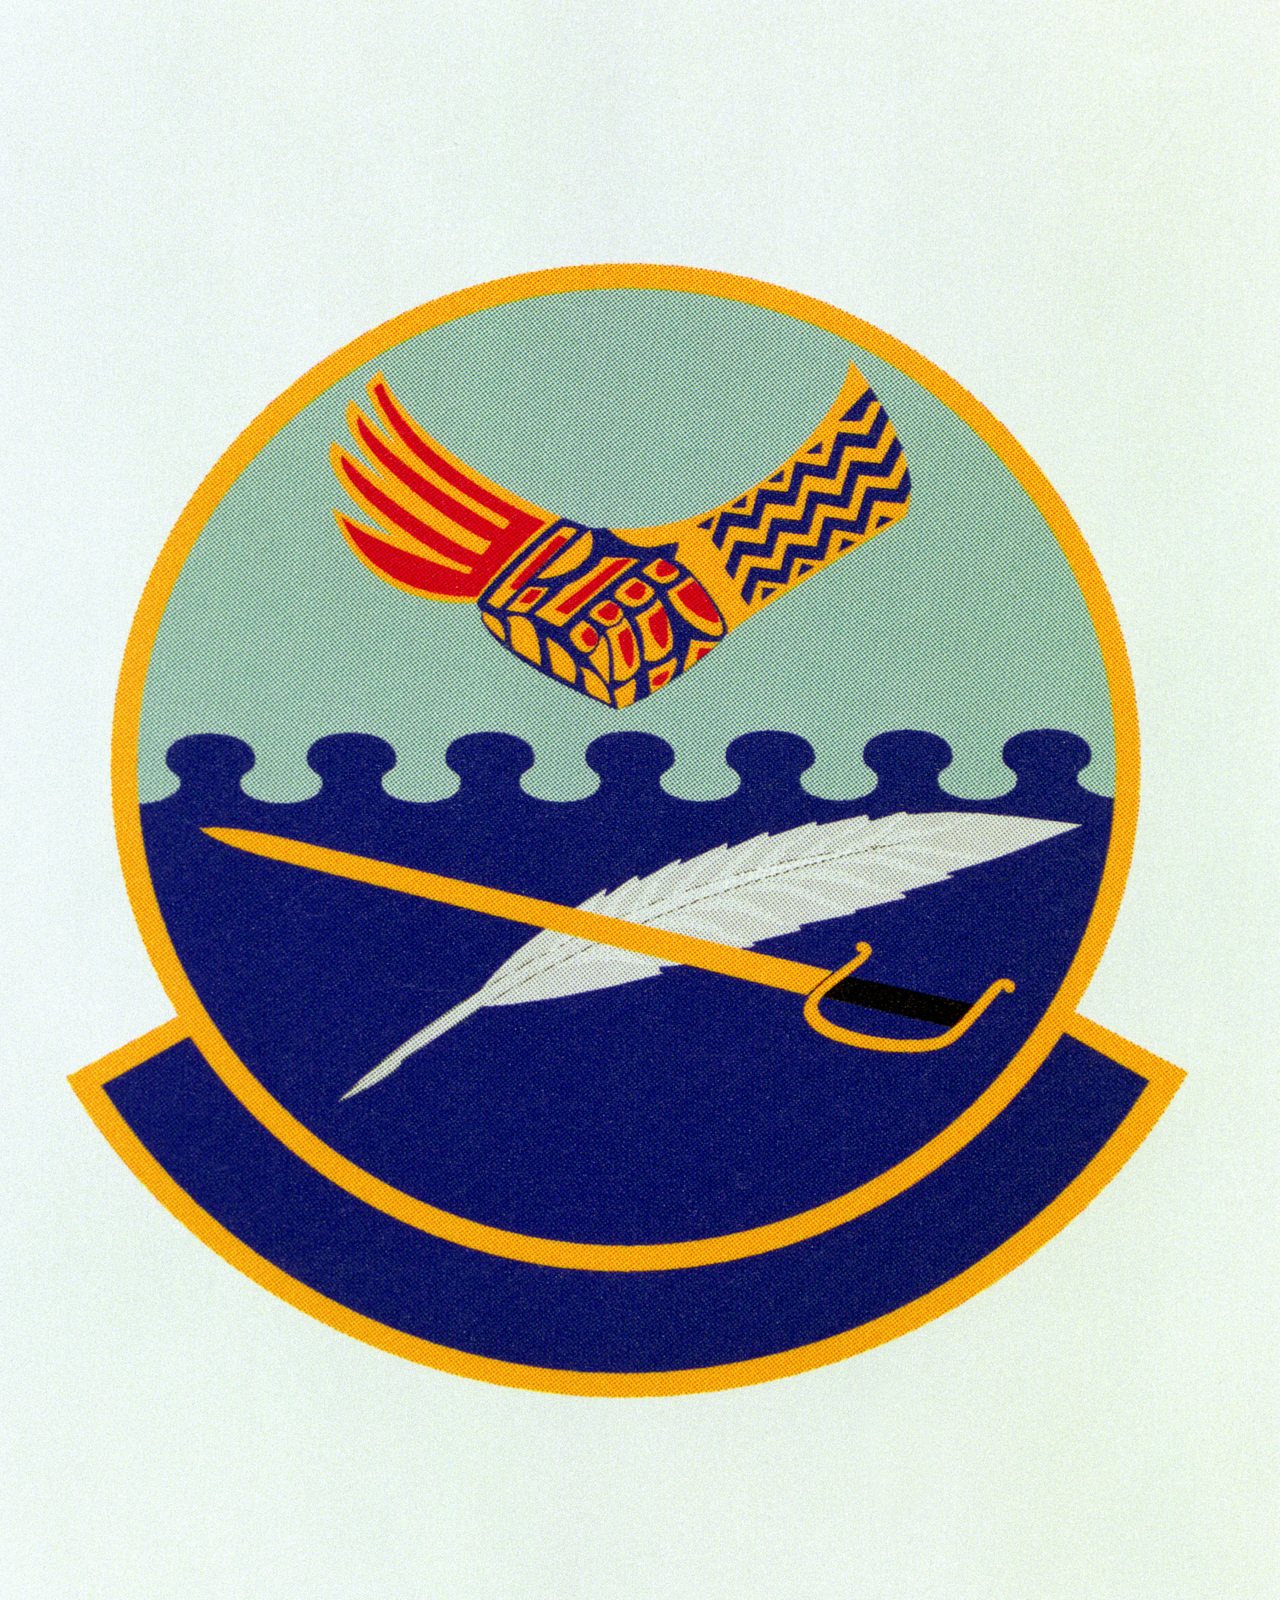 Organization Emblems And Symbols Topsimages